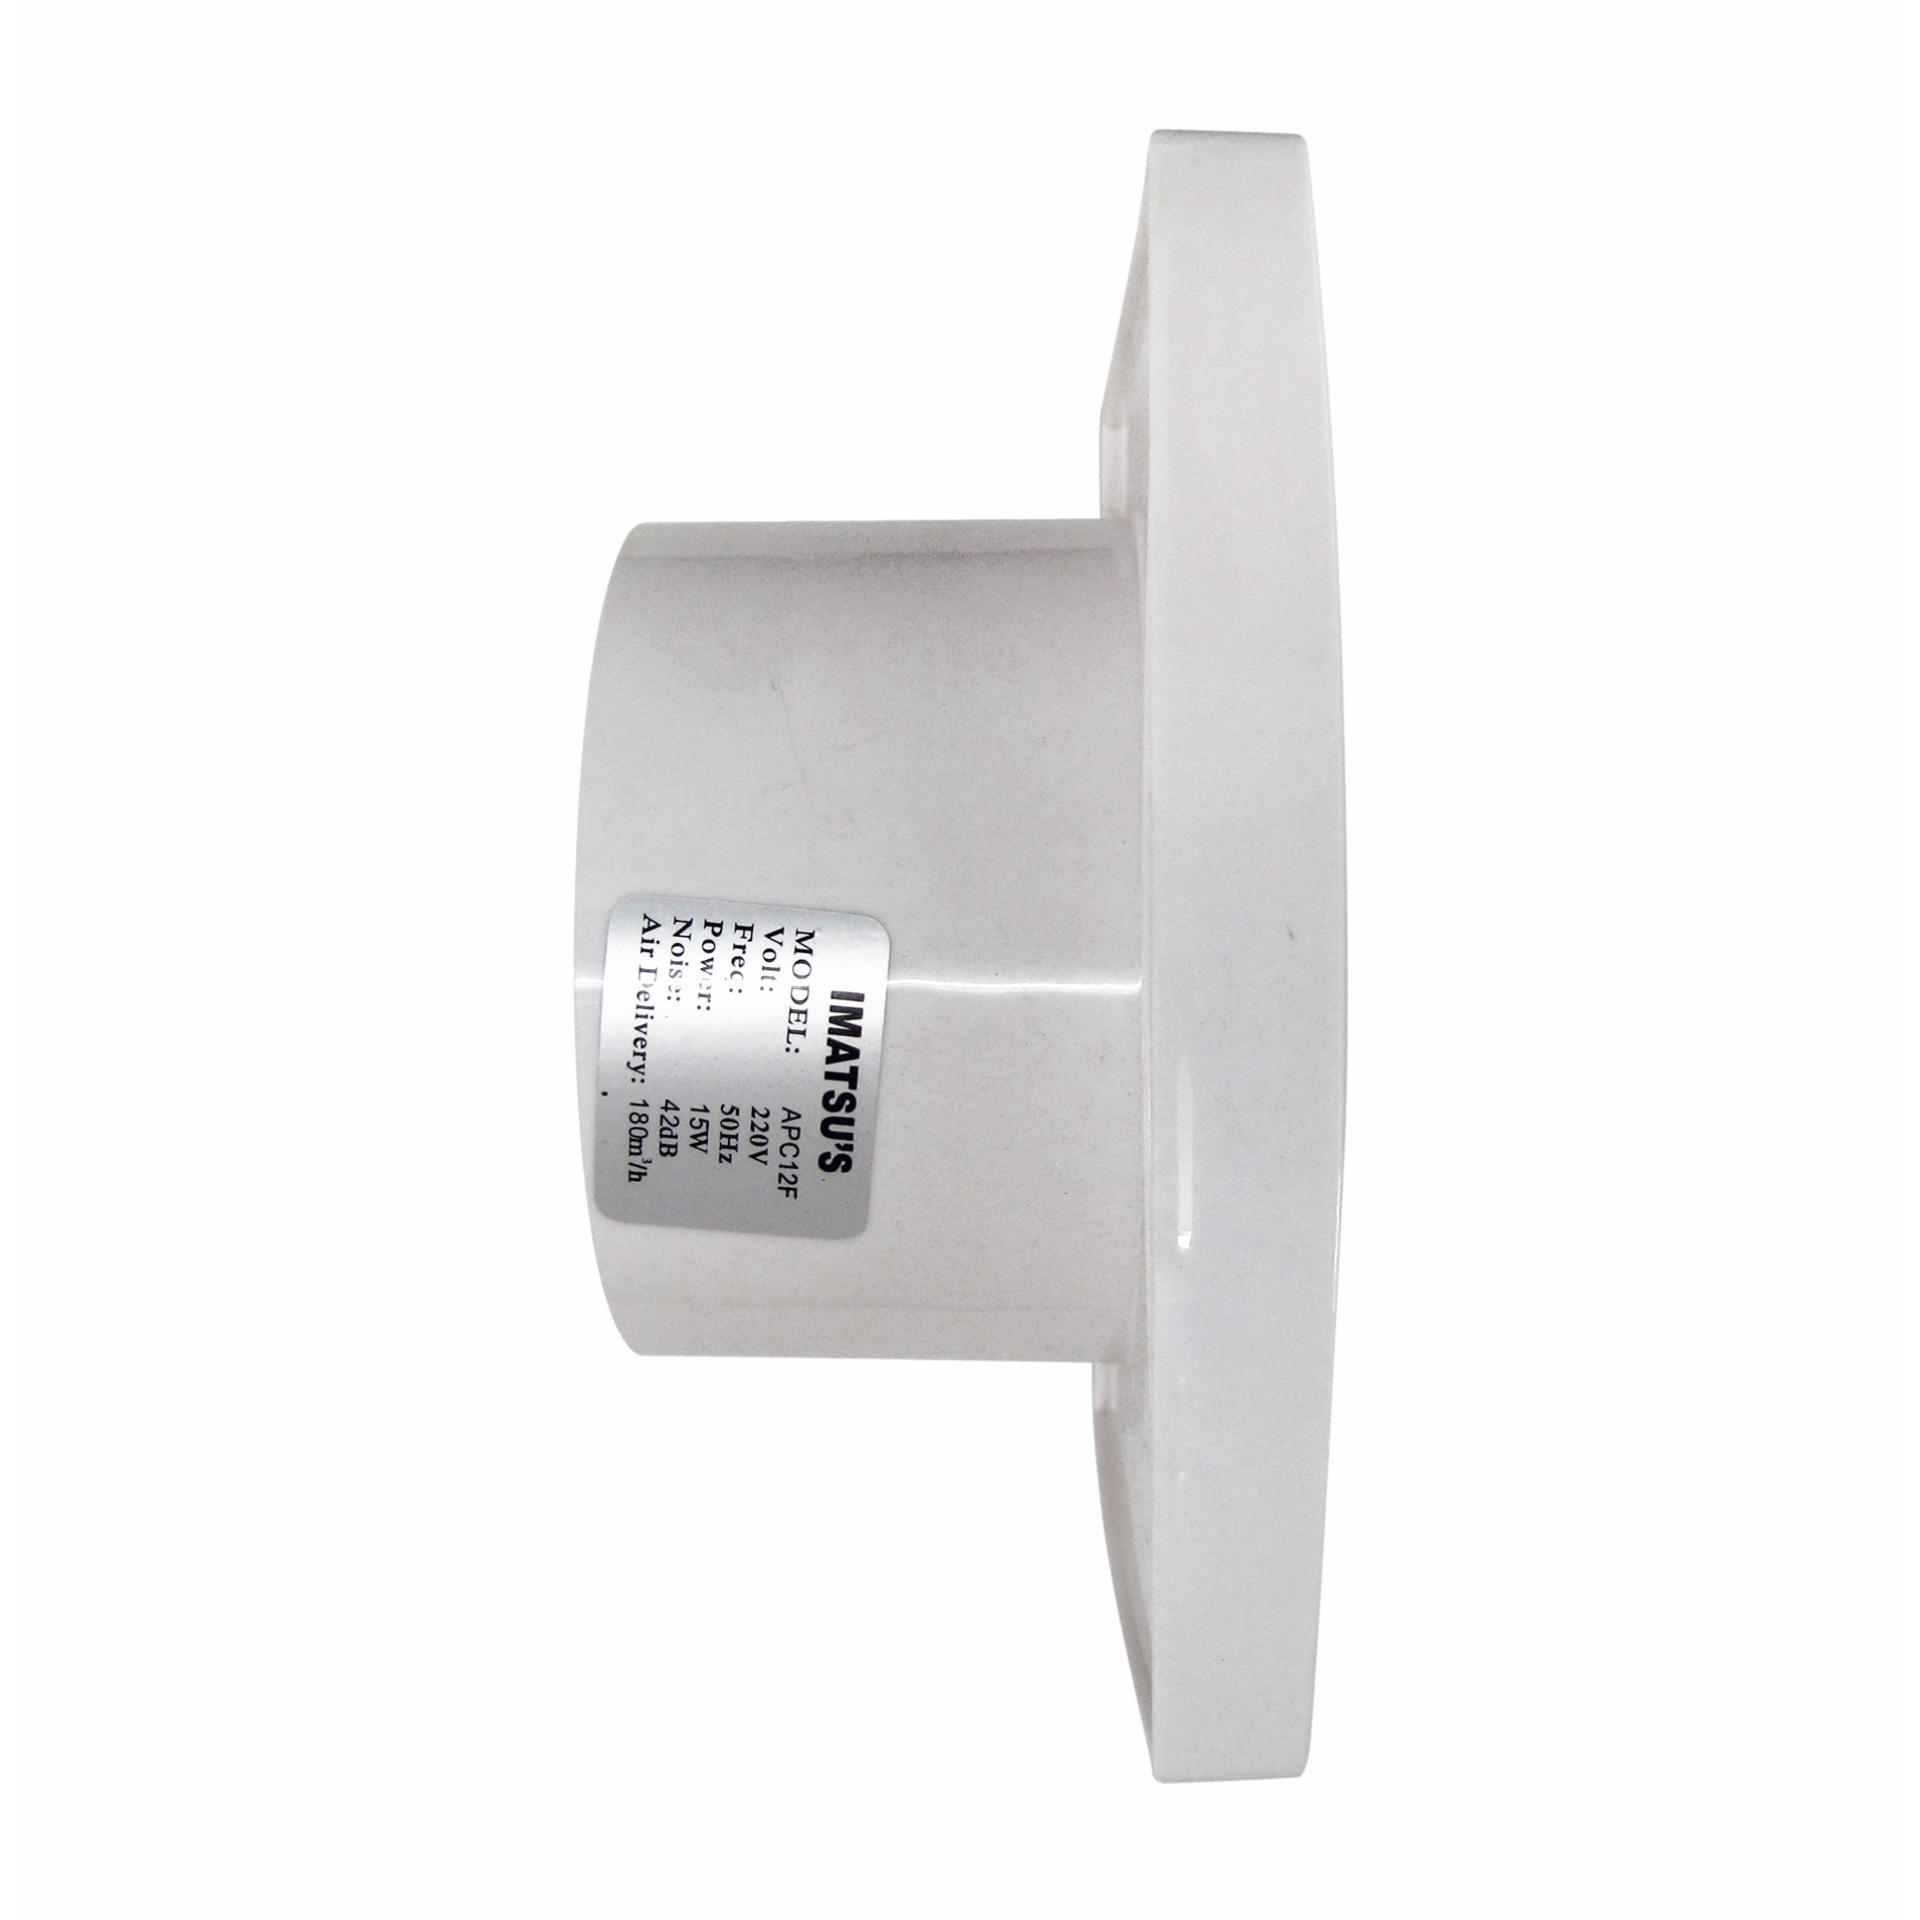 Exhaust Fan Imatsu EF-BPT10-12F-LED-BB-ST 8 Inch. Source · Exhaust Fan Imatsu APC12F With LED 5 Inch Rumah Toilet Dapur Udara Hisap .